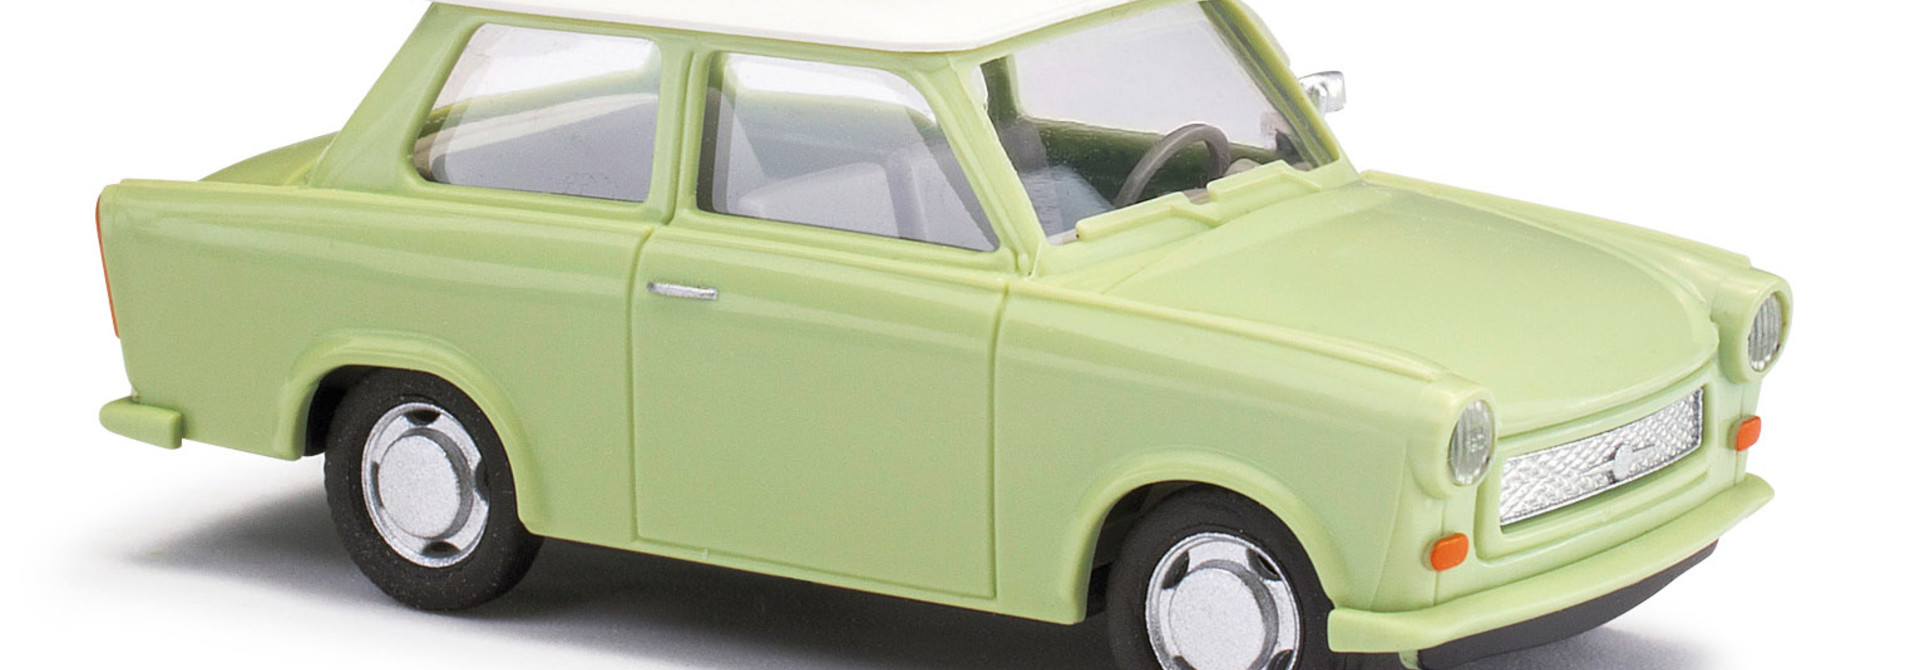 Trabant P601 Limousine, Grün/weißes Dach 53106